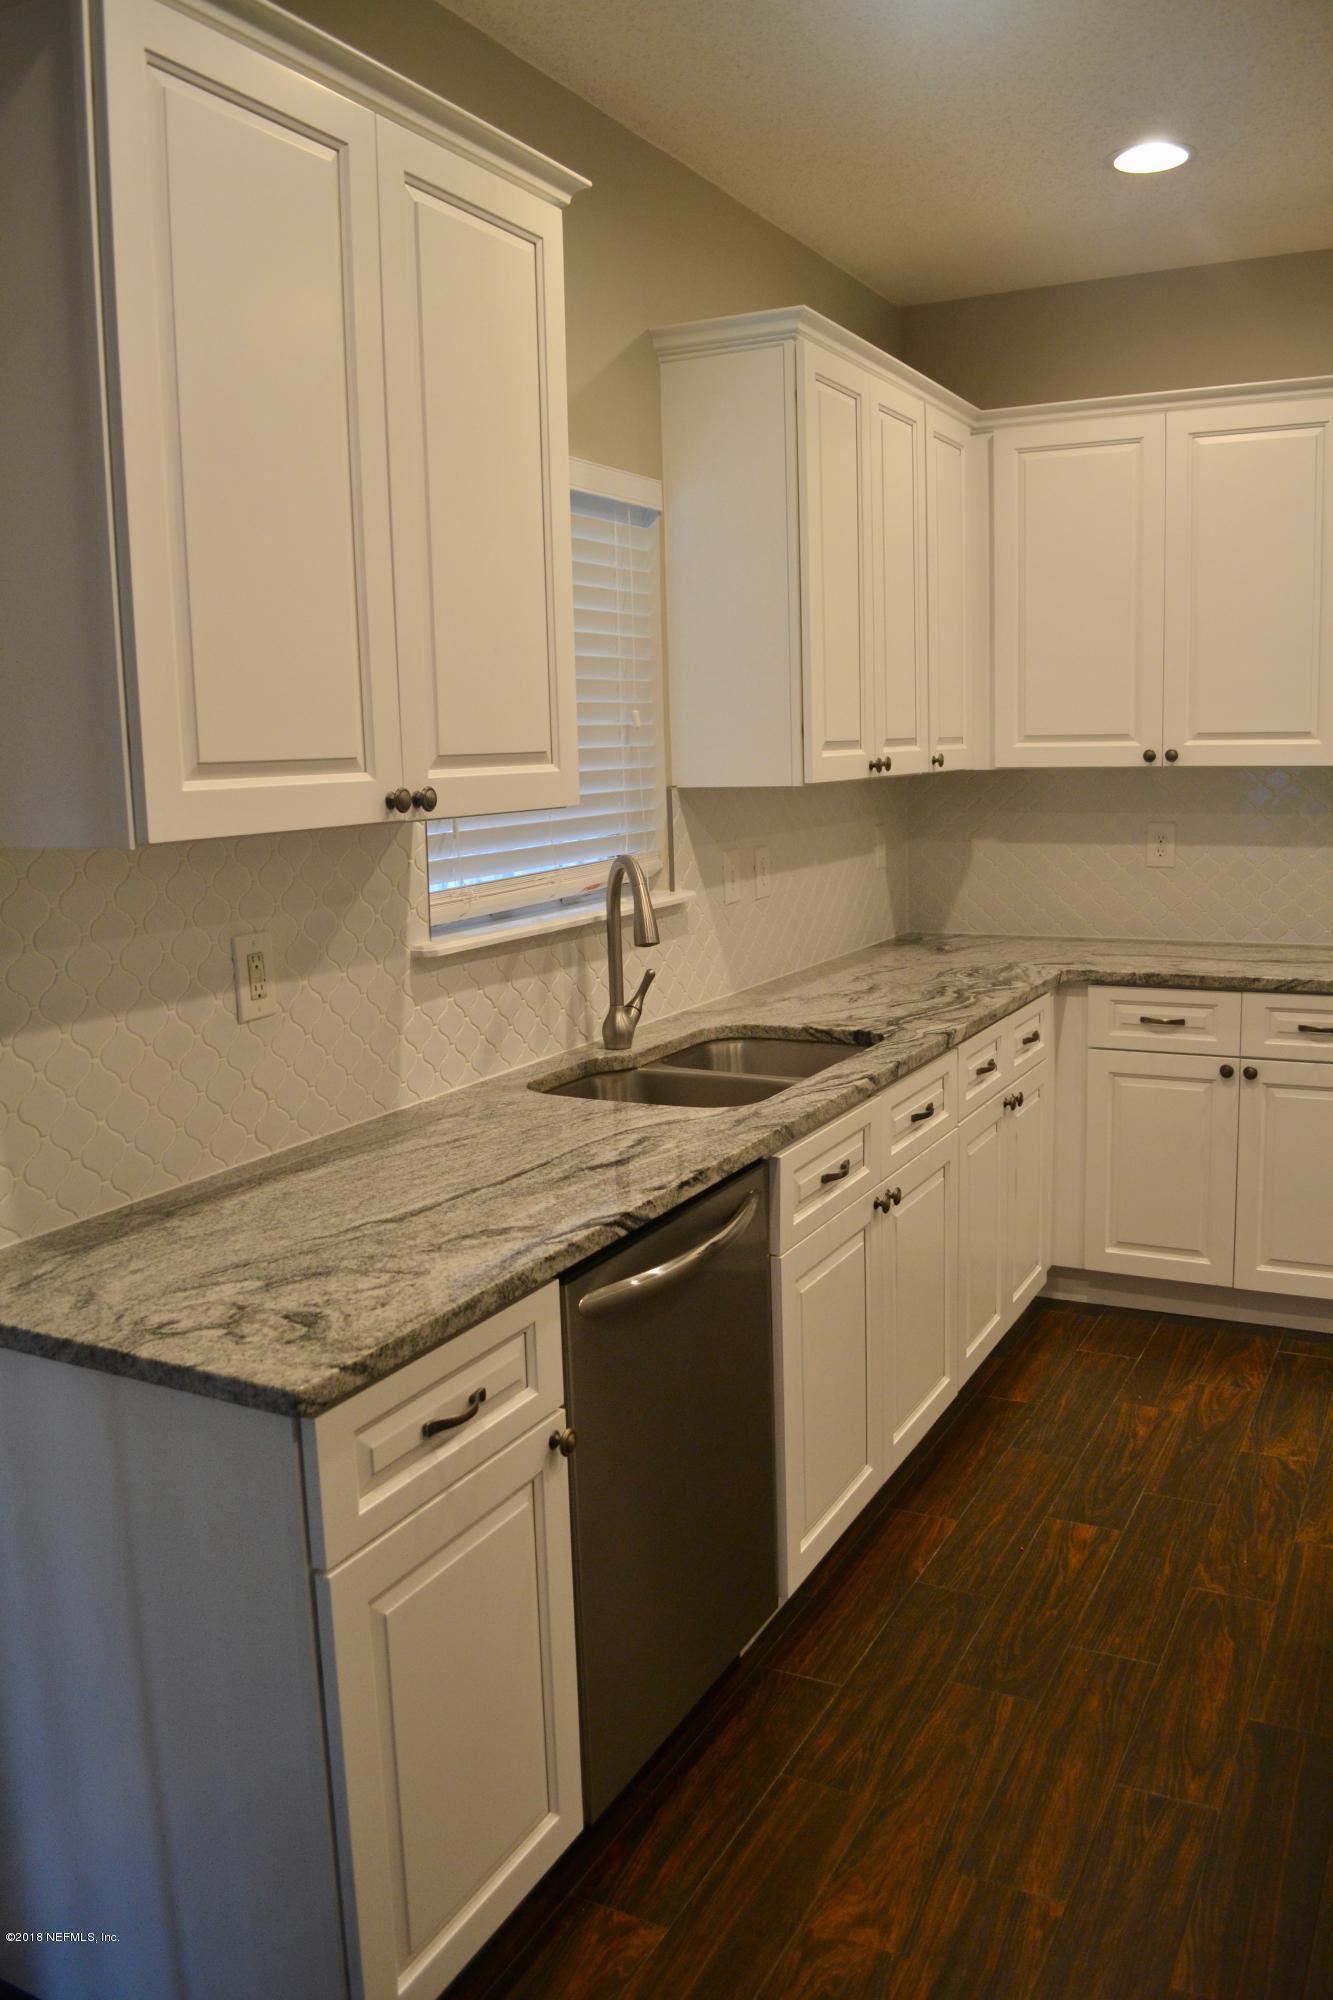 14925 BULOW CREEK, JACKSONVILLE, FLORIDA 32258, 5 Bedrooms Bedrooms, ,3 BathroomsBathrooms,Residential - single family,For sale,BULOW CREEK,941738